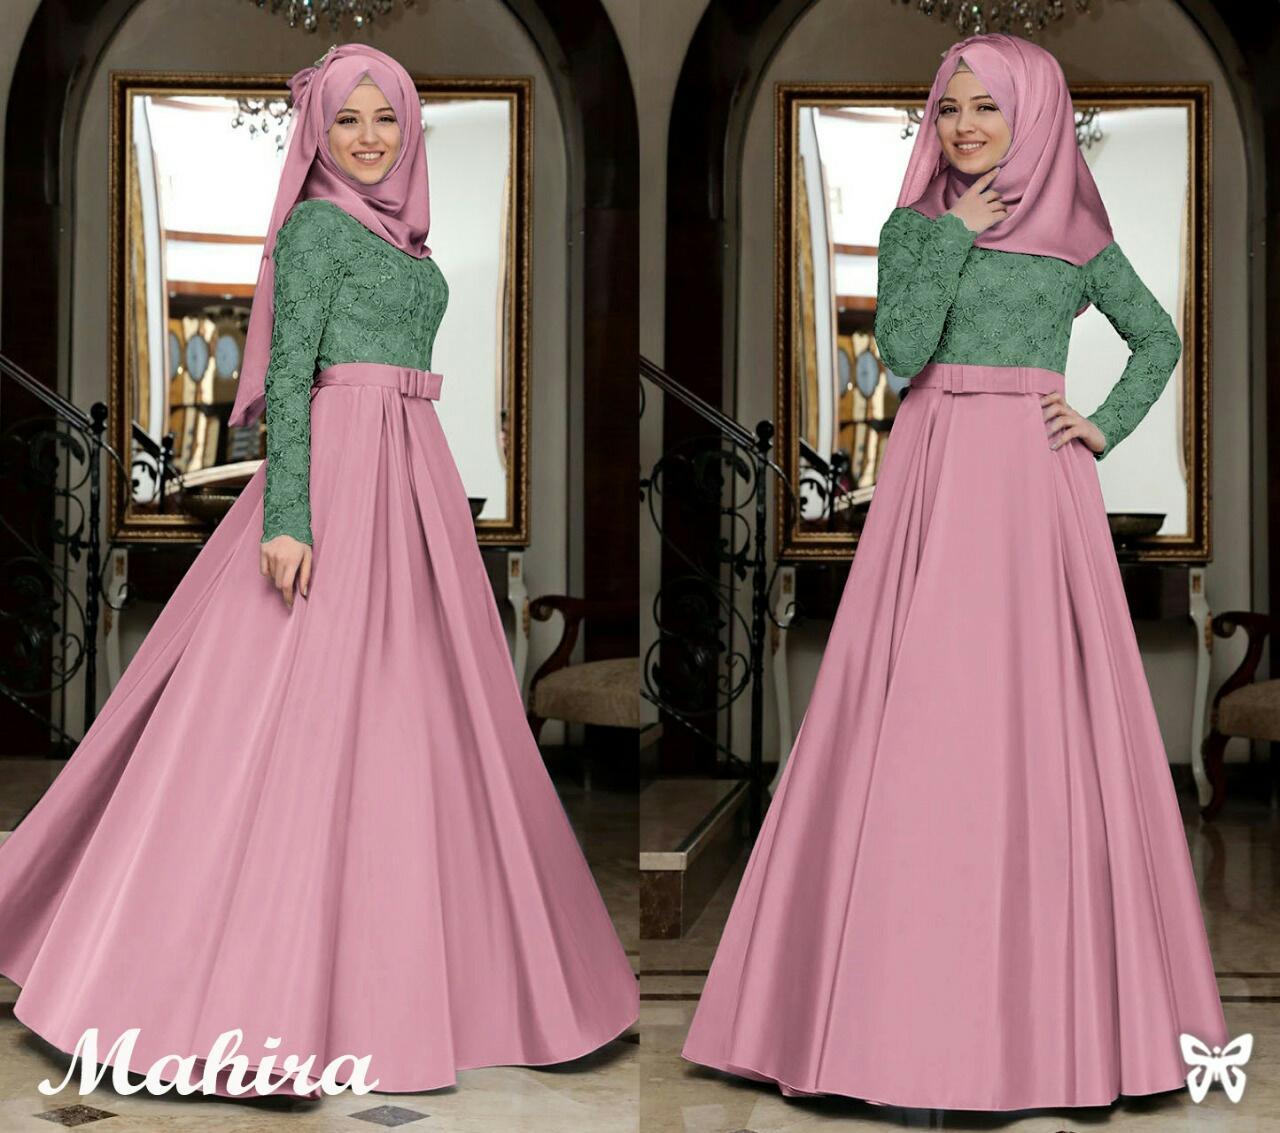 J C Setelan Muslim Mahira Gliter   Dress Maxi   Maxi Muslim   Setelan Maxi  Dress   95fbc98f8b